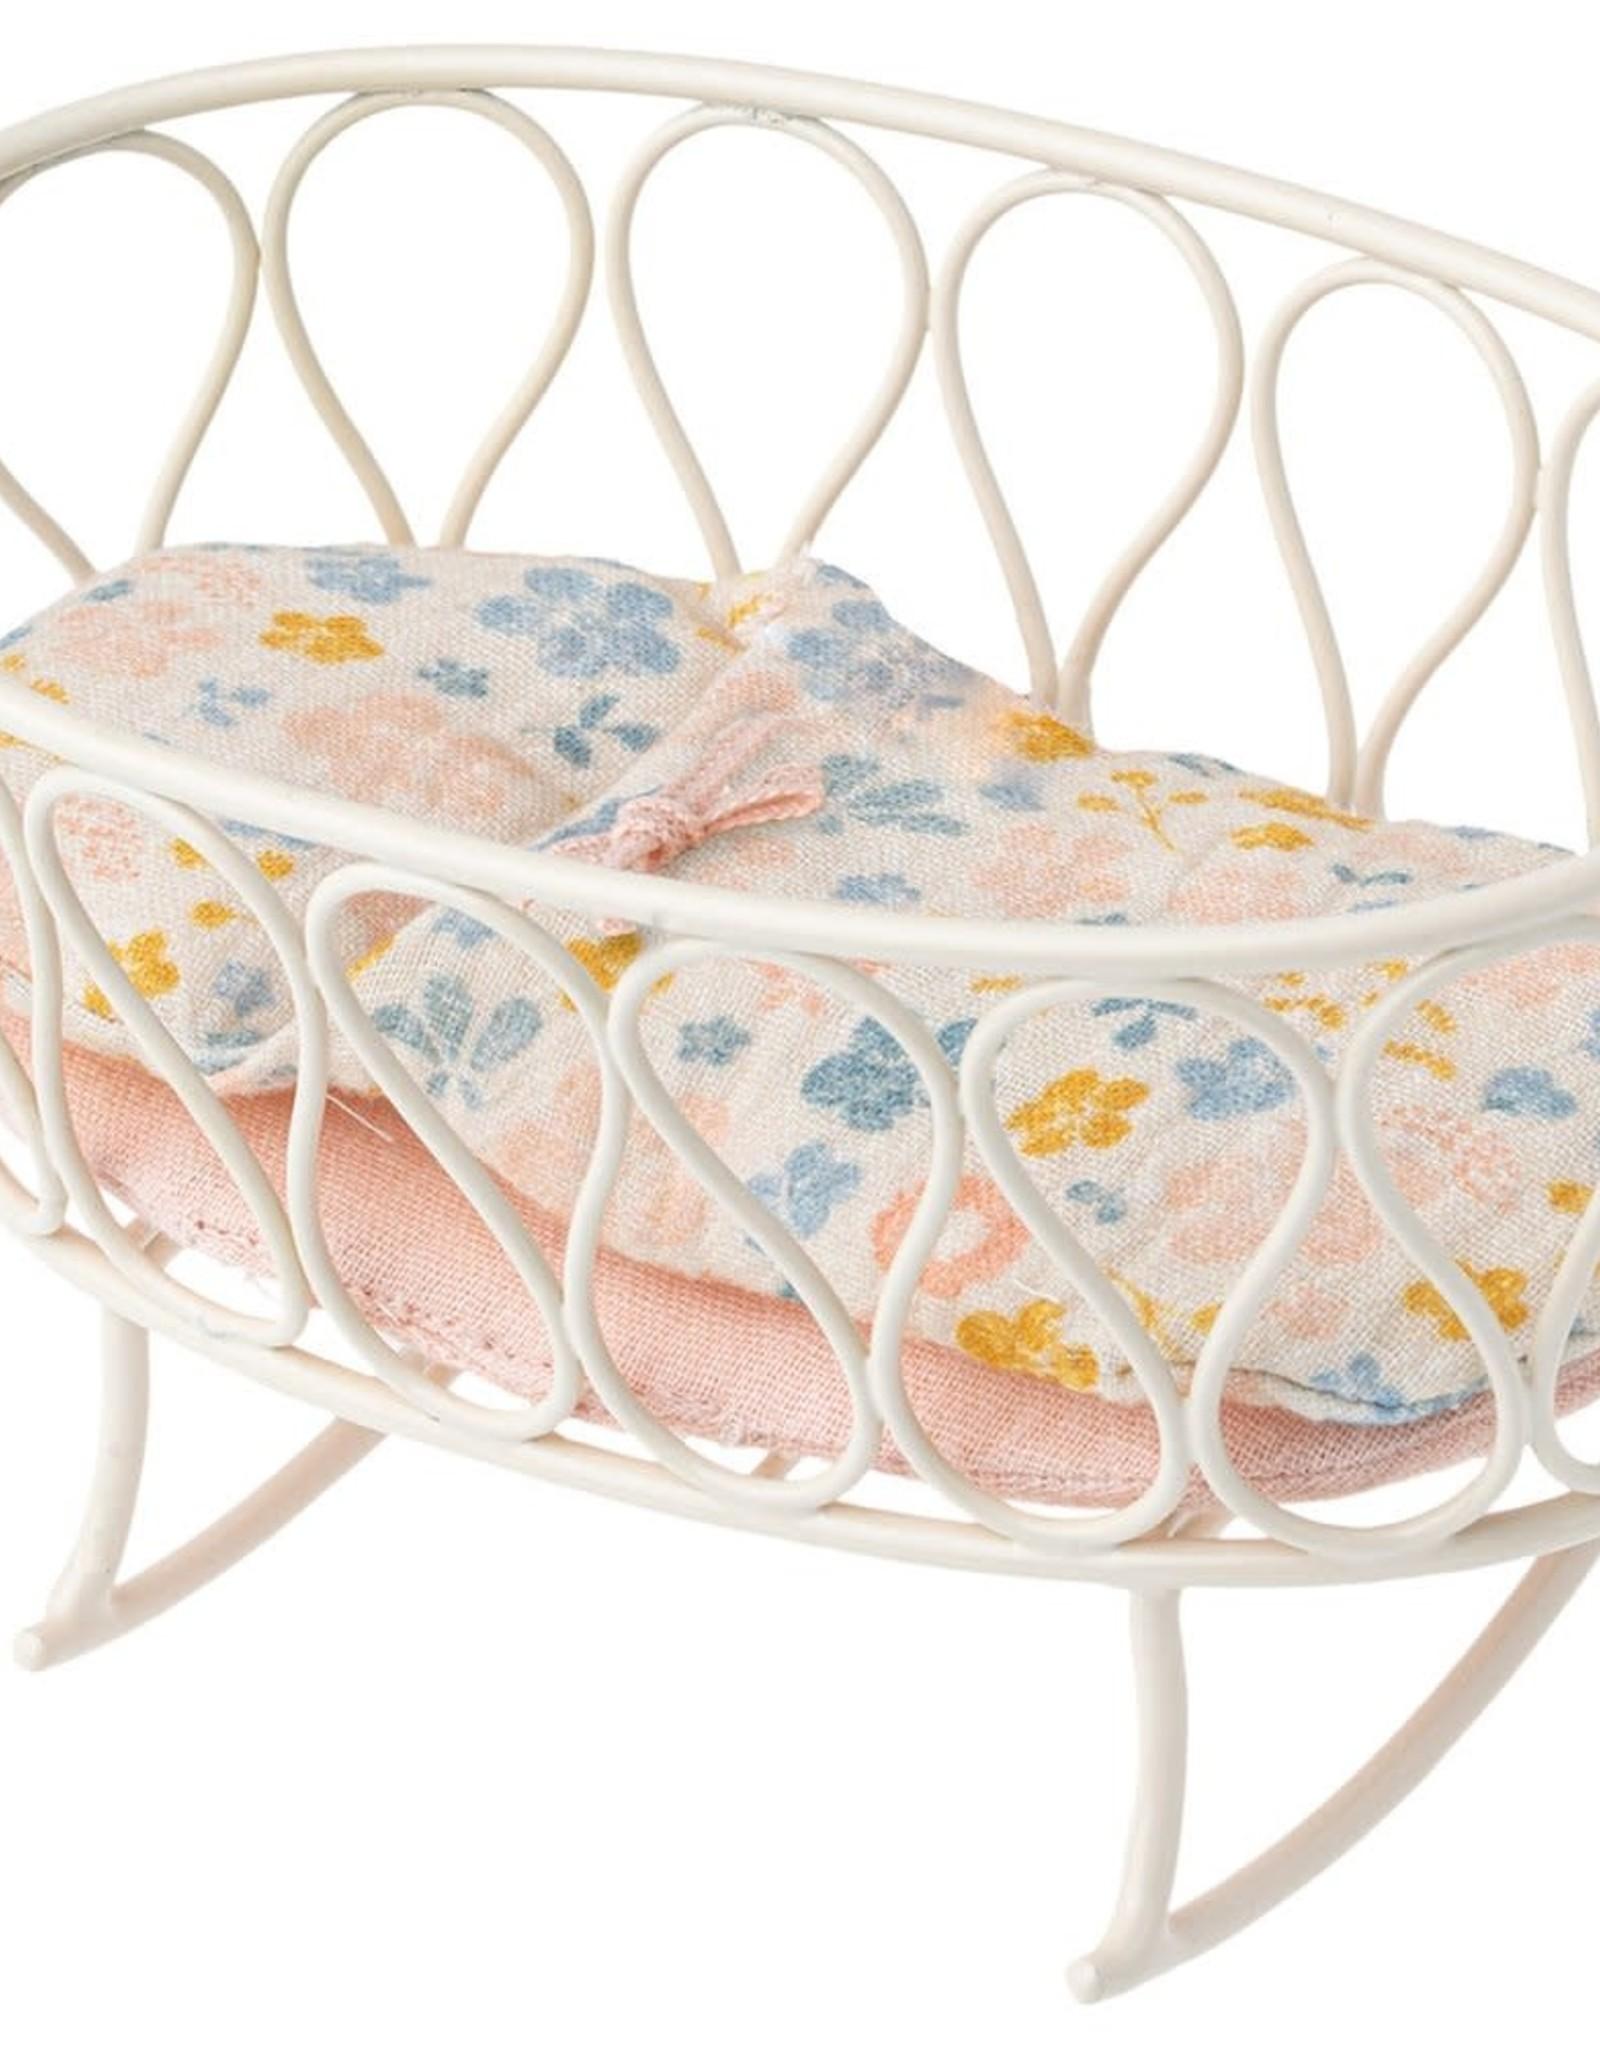 Maileg Cradle with Sleeping Bag, Micro